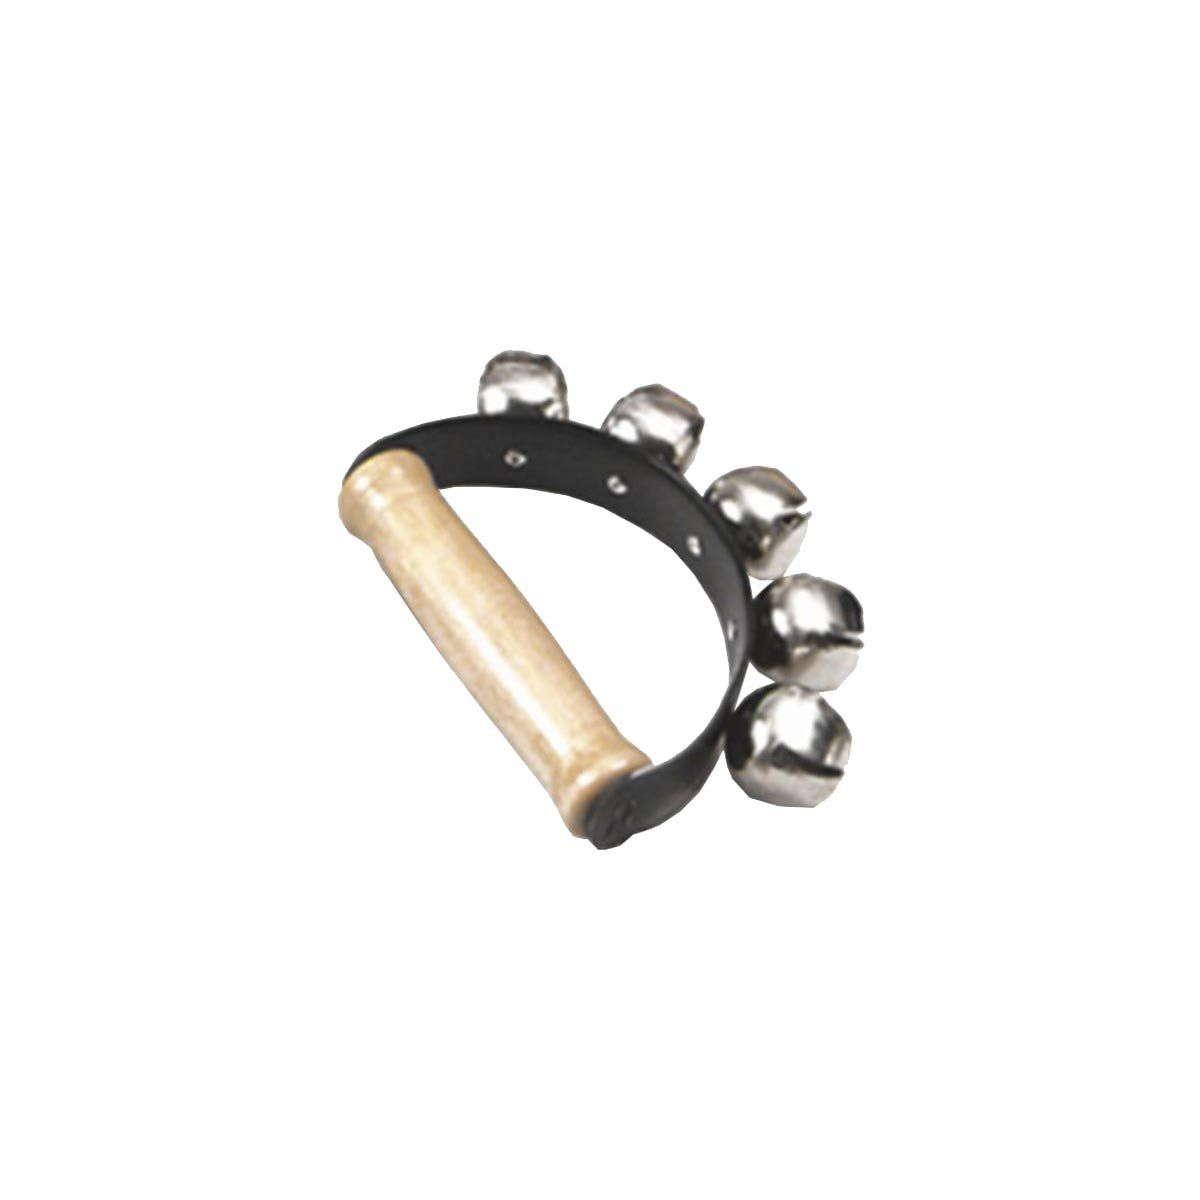 Campanela de Mão c/ 5 Esferas de Metal - TB 3005 CSR